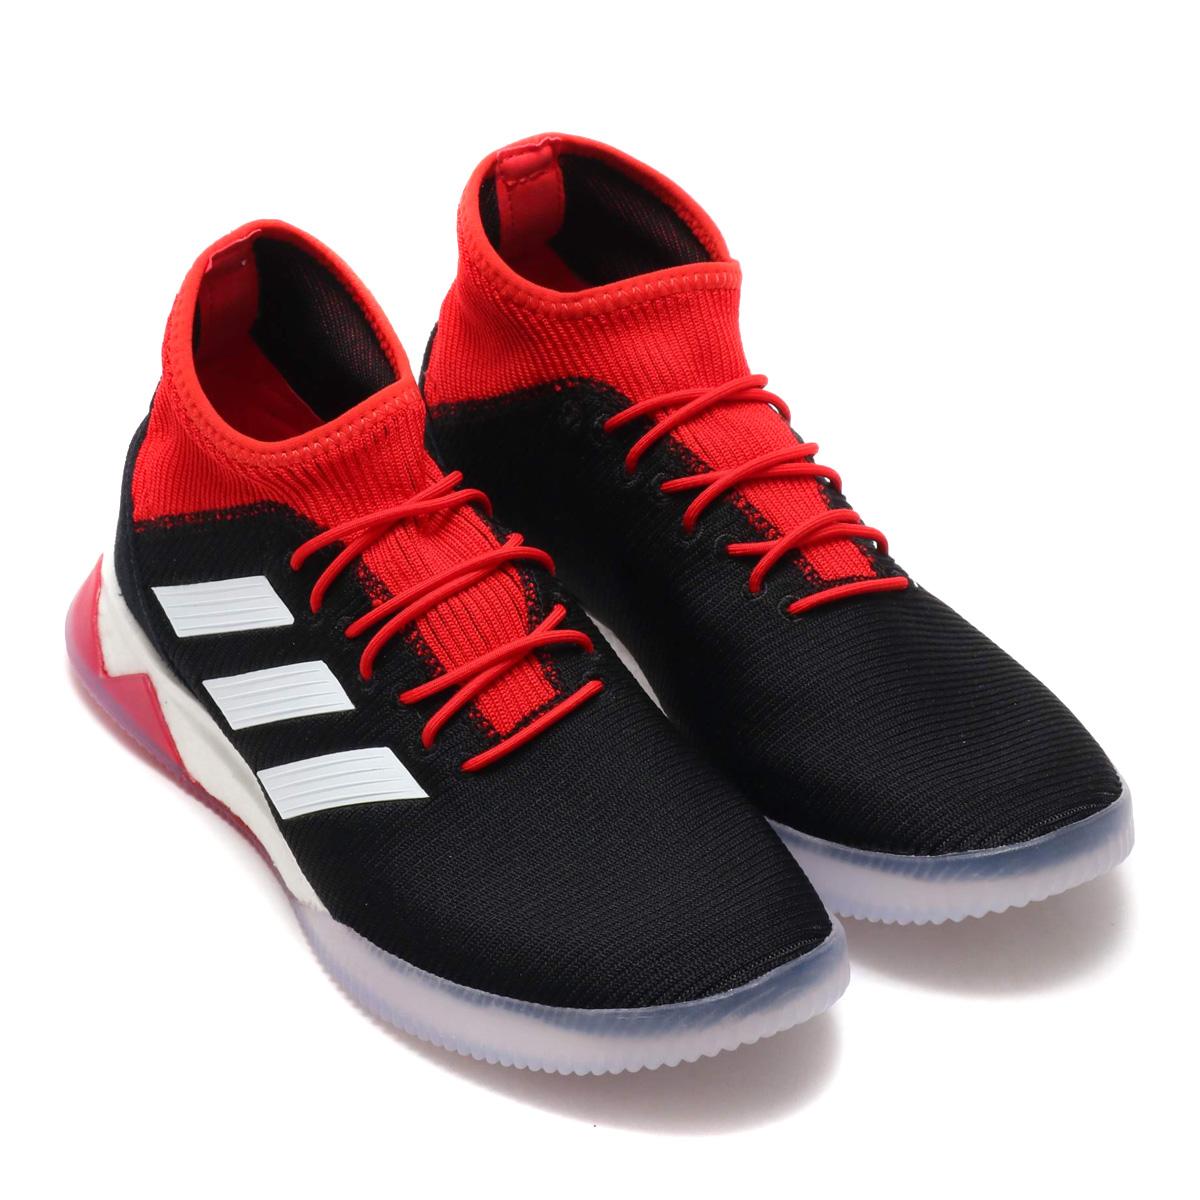 f8f86b4c6b09 adidas PREDATOR TANGO 18.1 TR (Adidas predator tango 18.1 TR) CORE BLACK/RUNNING  ...